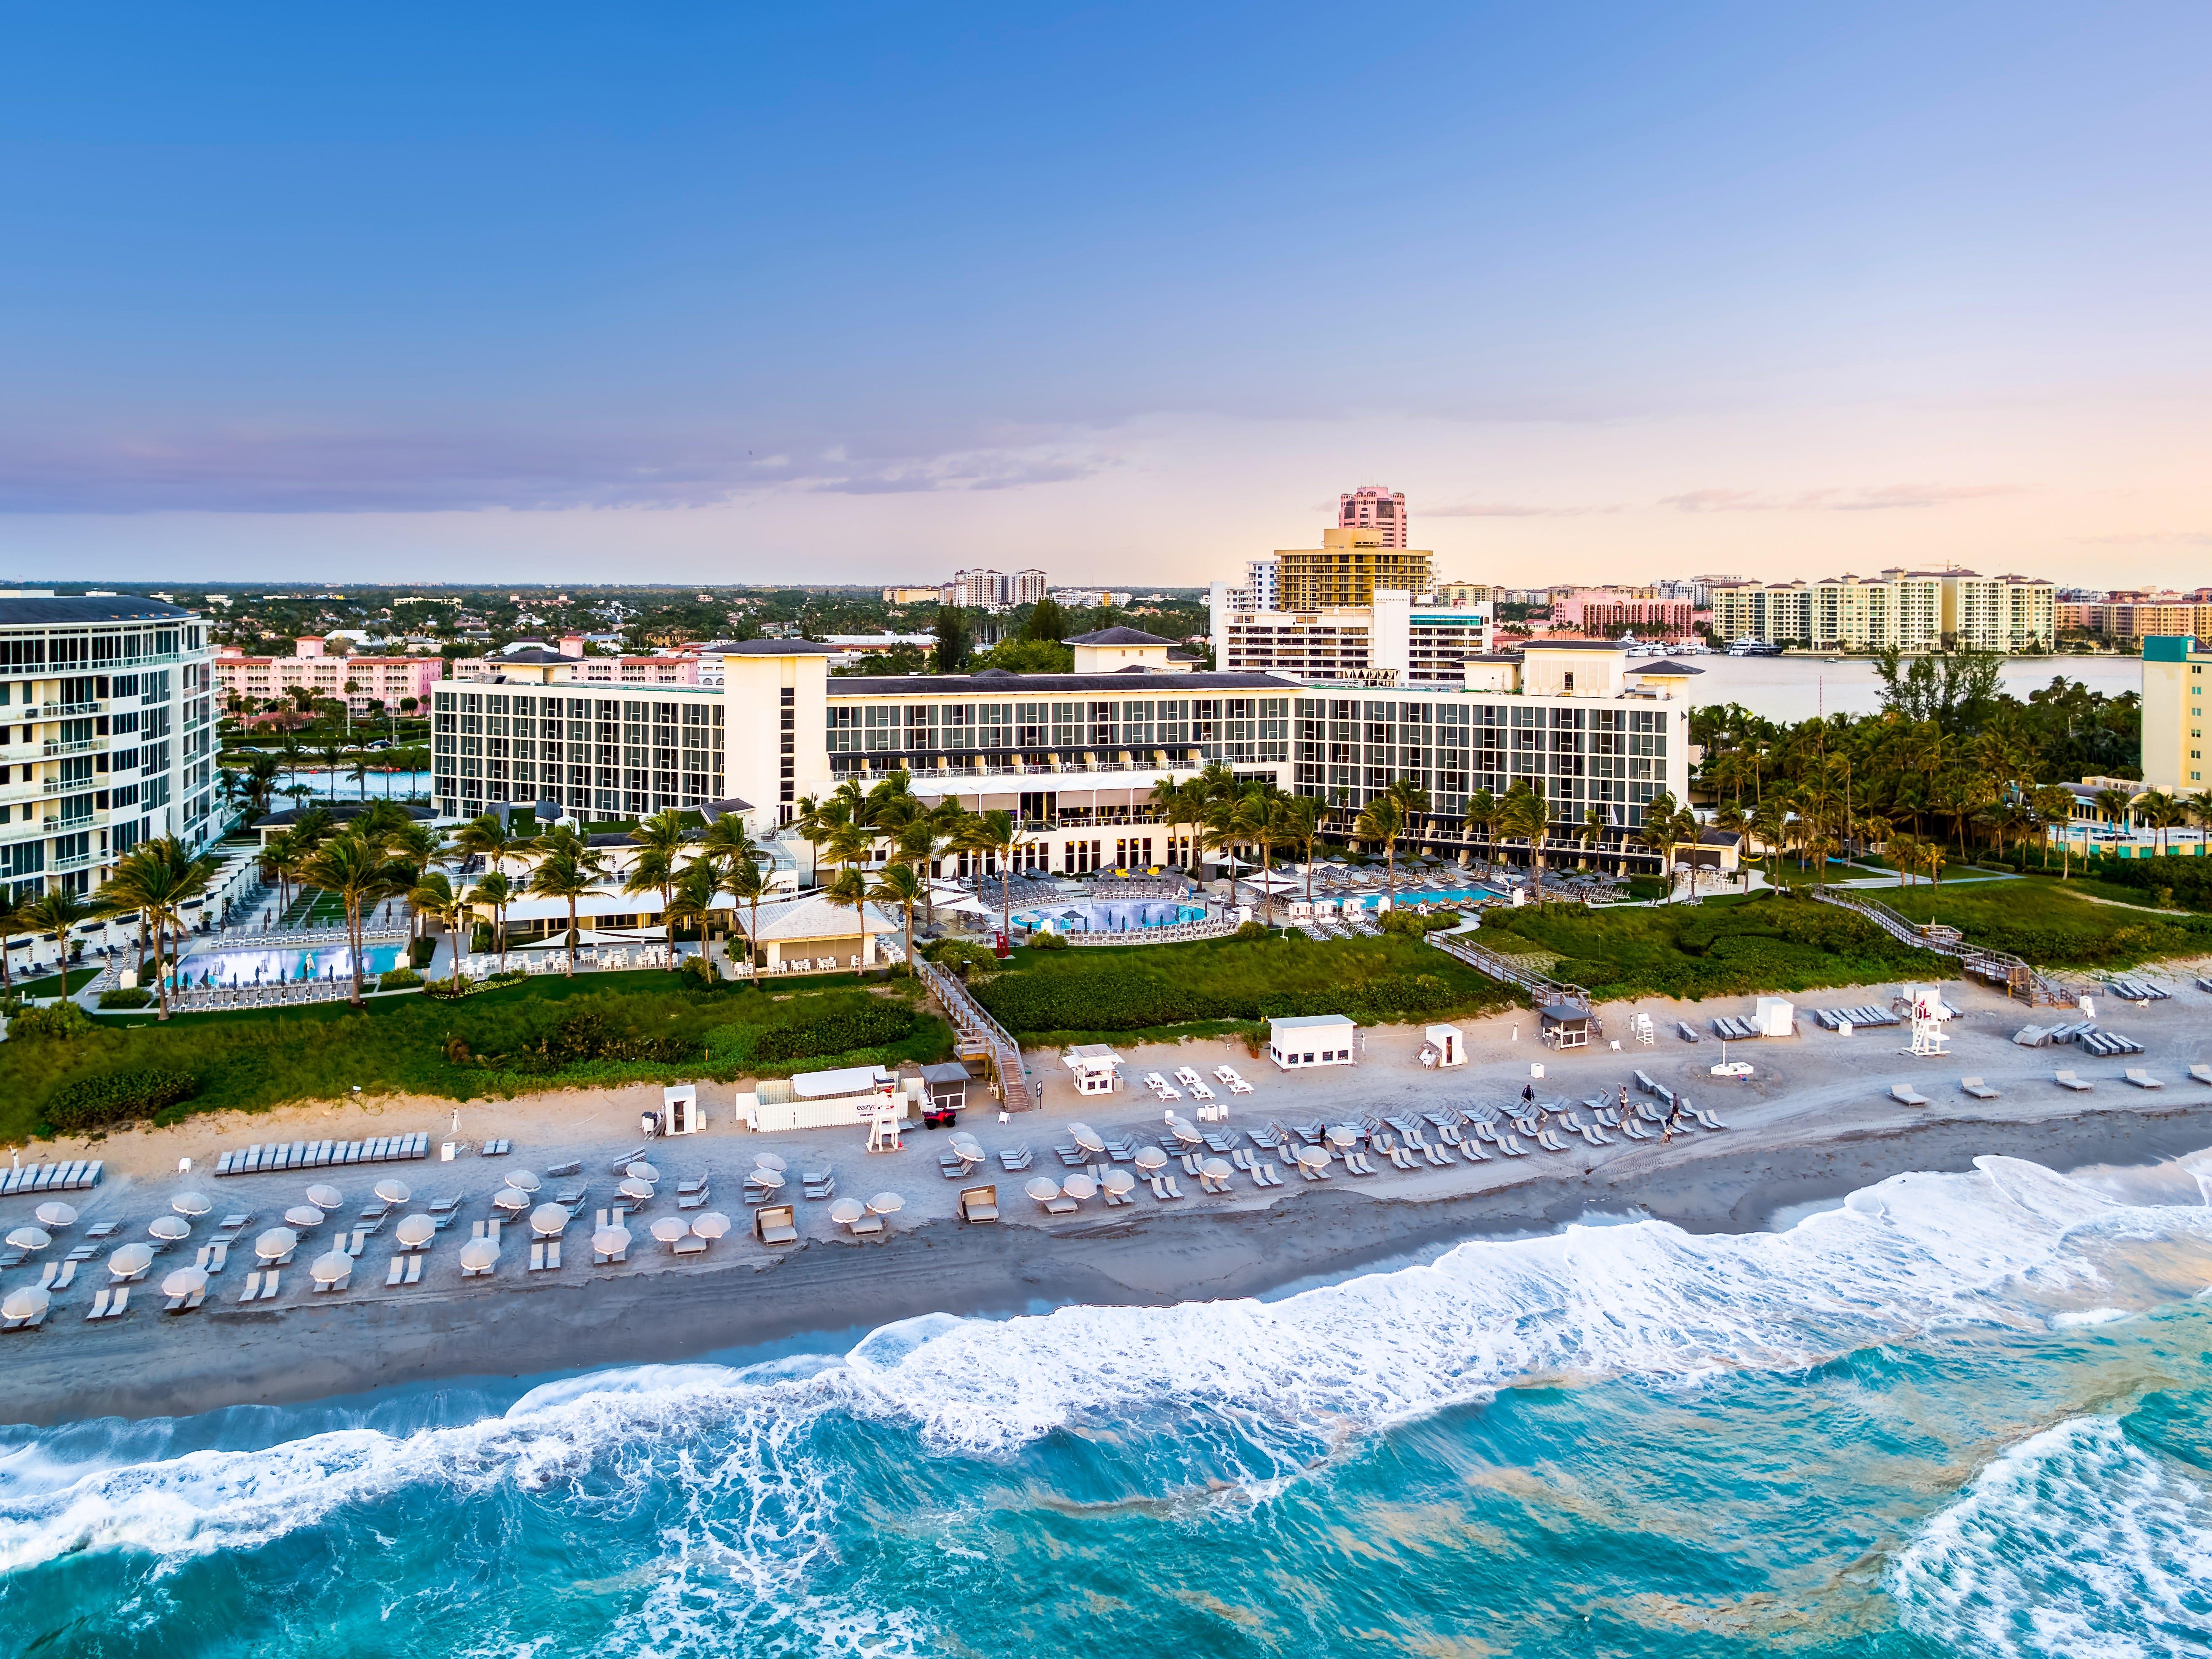 Boca Beach Club, a part of Boca Raton Resort & Club, sits on the Atlantic Ocean.